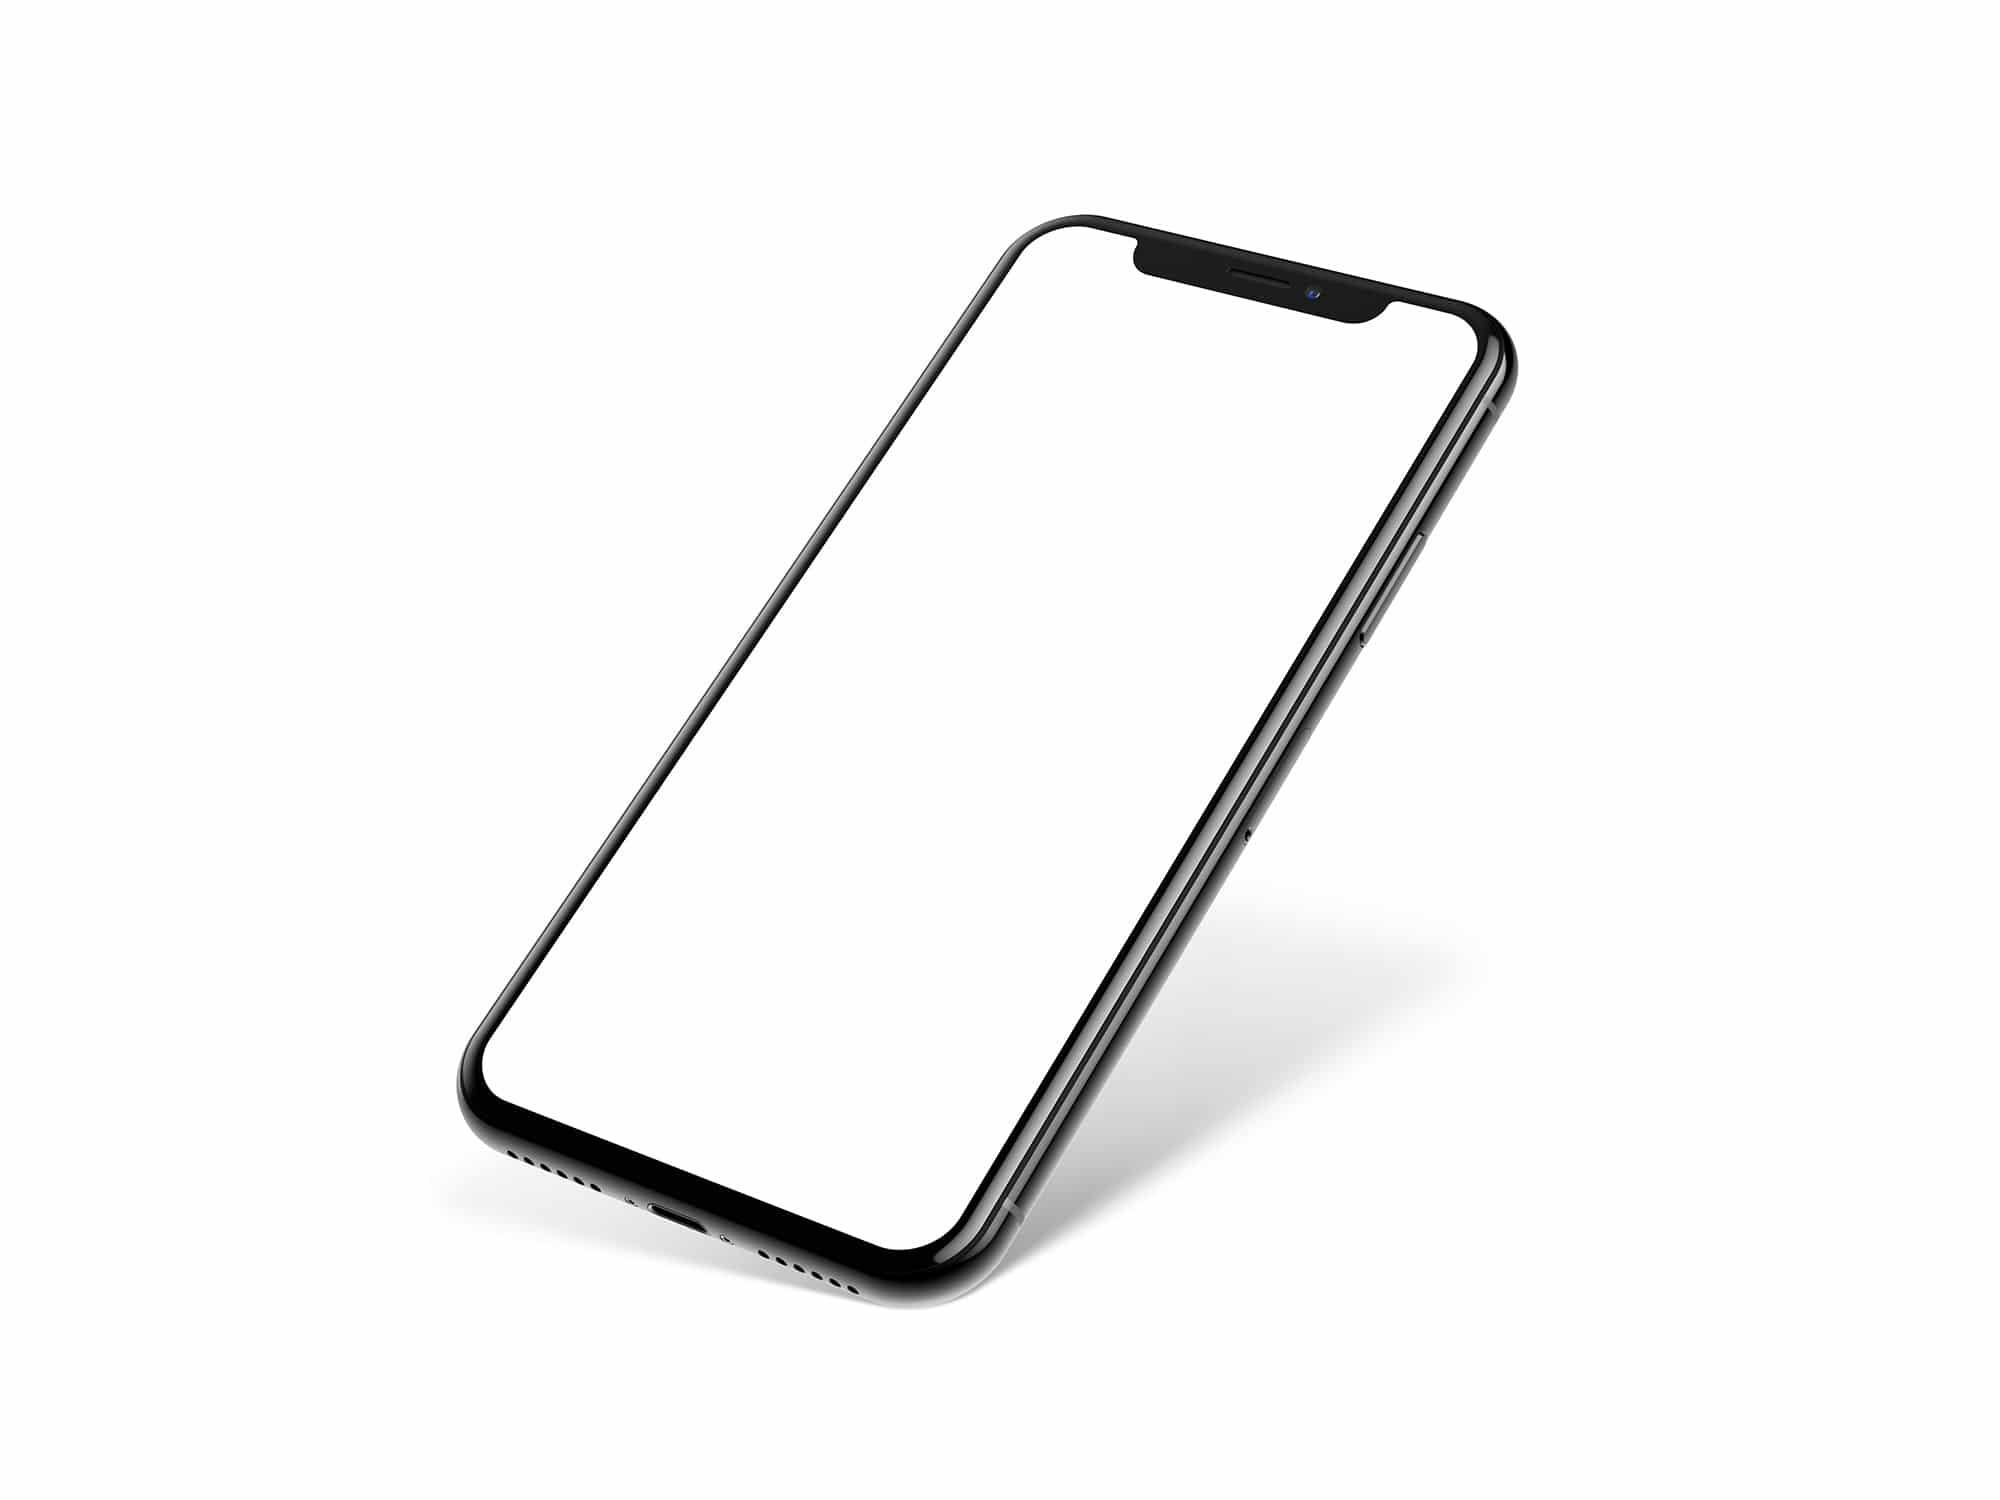 iPhone X Perspective Mockup | The Mockup Club